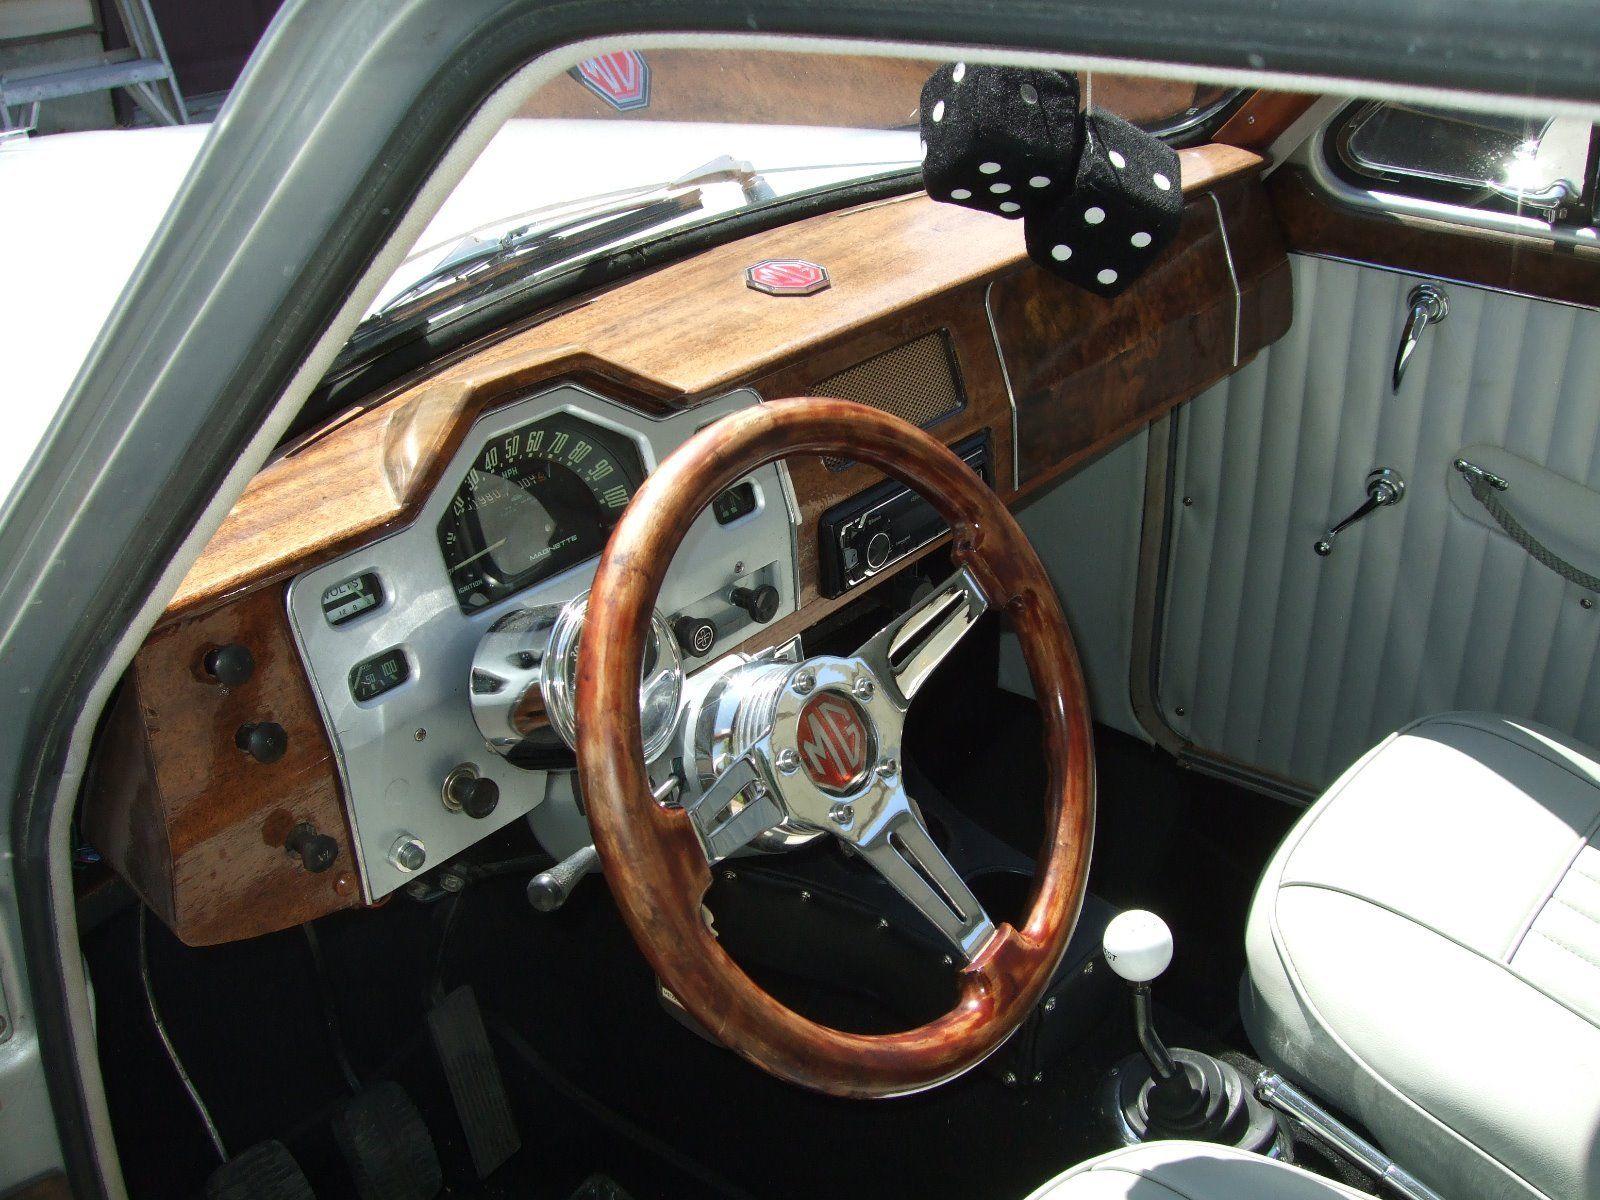 1957-Magnette-with-a-Ford-V8-04 Under The Hood Wiring Harness on under hood shocks, under hood dimensions, under hood gauges, under hood battery, under hood building, under hood components, under hood design, under hood paint, under hood parts, under hood inverter, under hood mirrors, under hood painting, under hood blue,